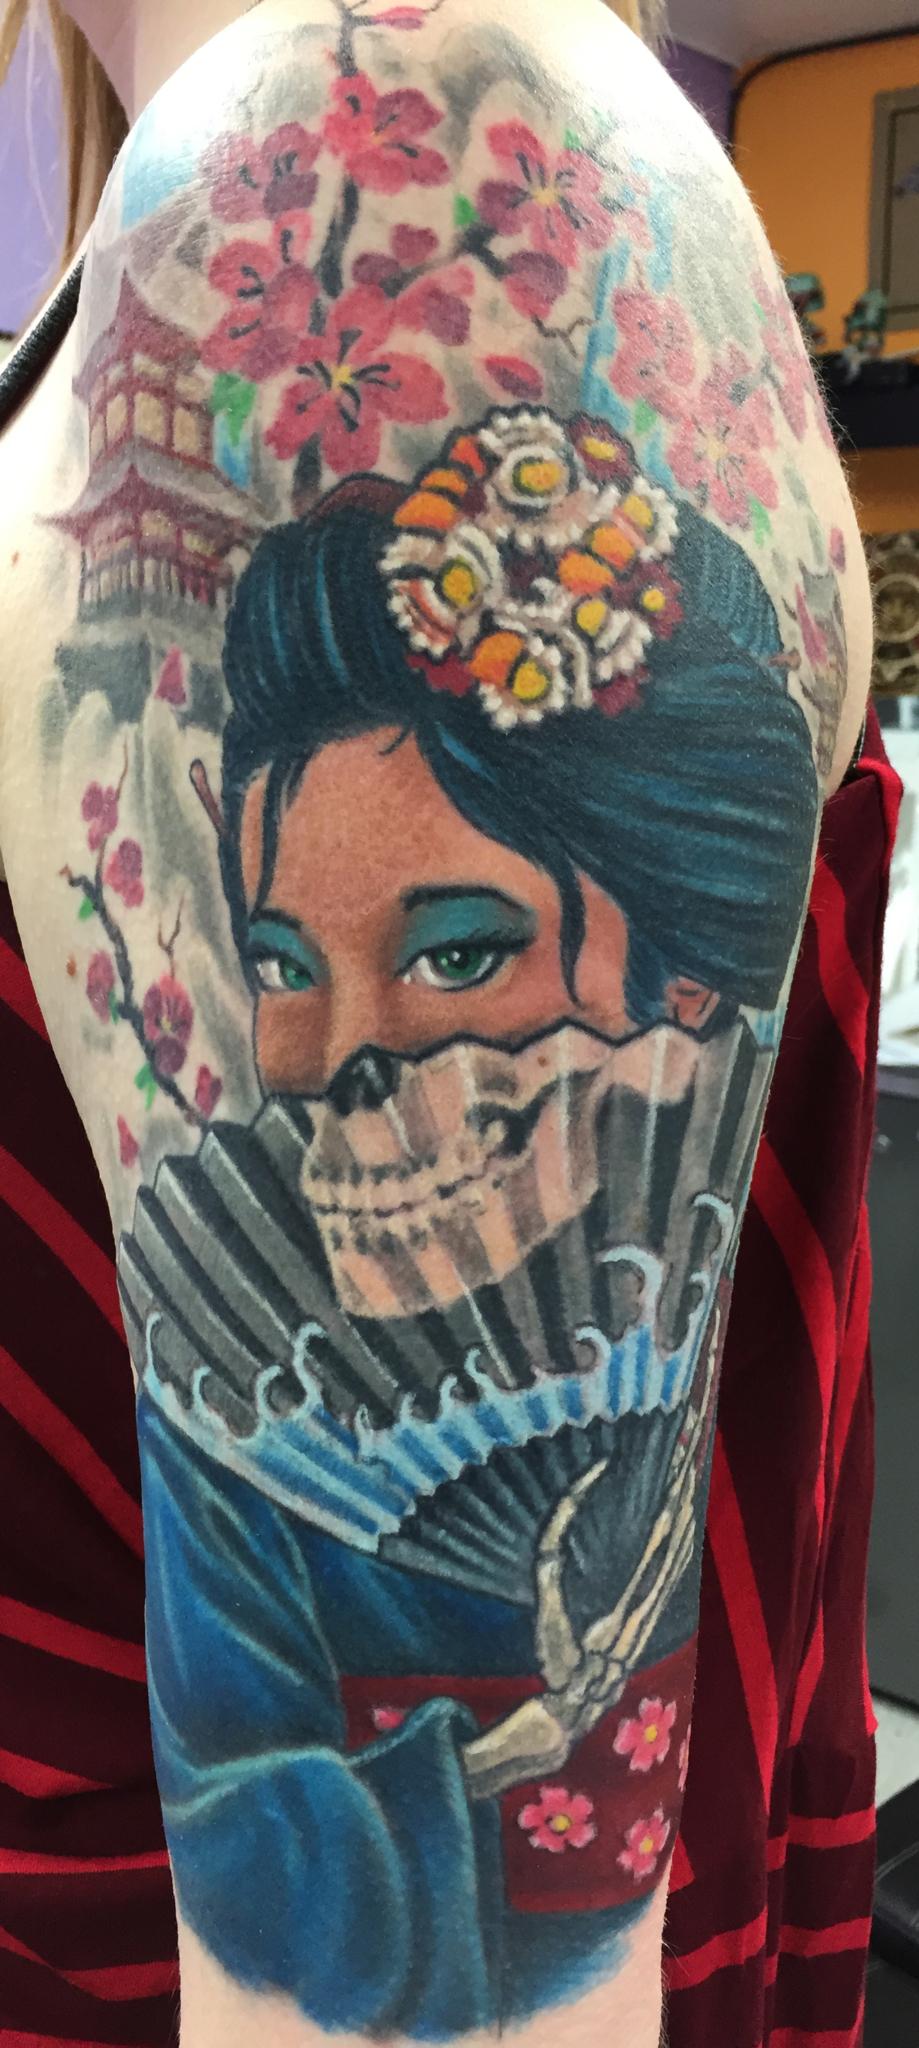 New Dimension Tattoos Calgary (403)719-8099